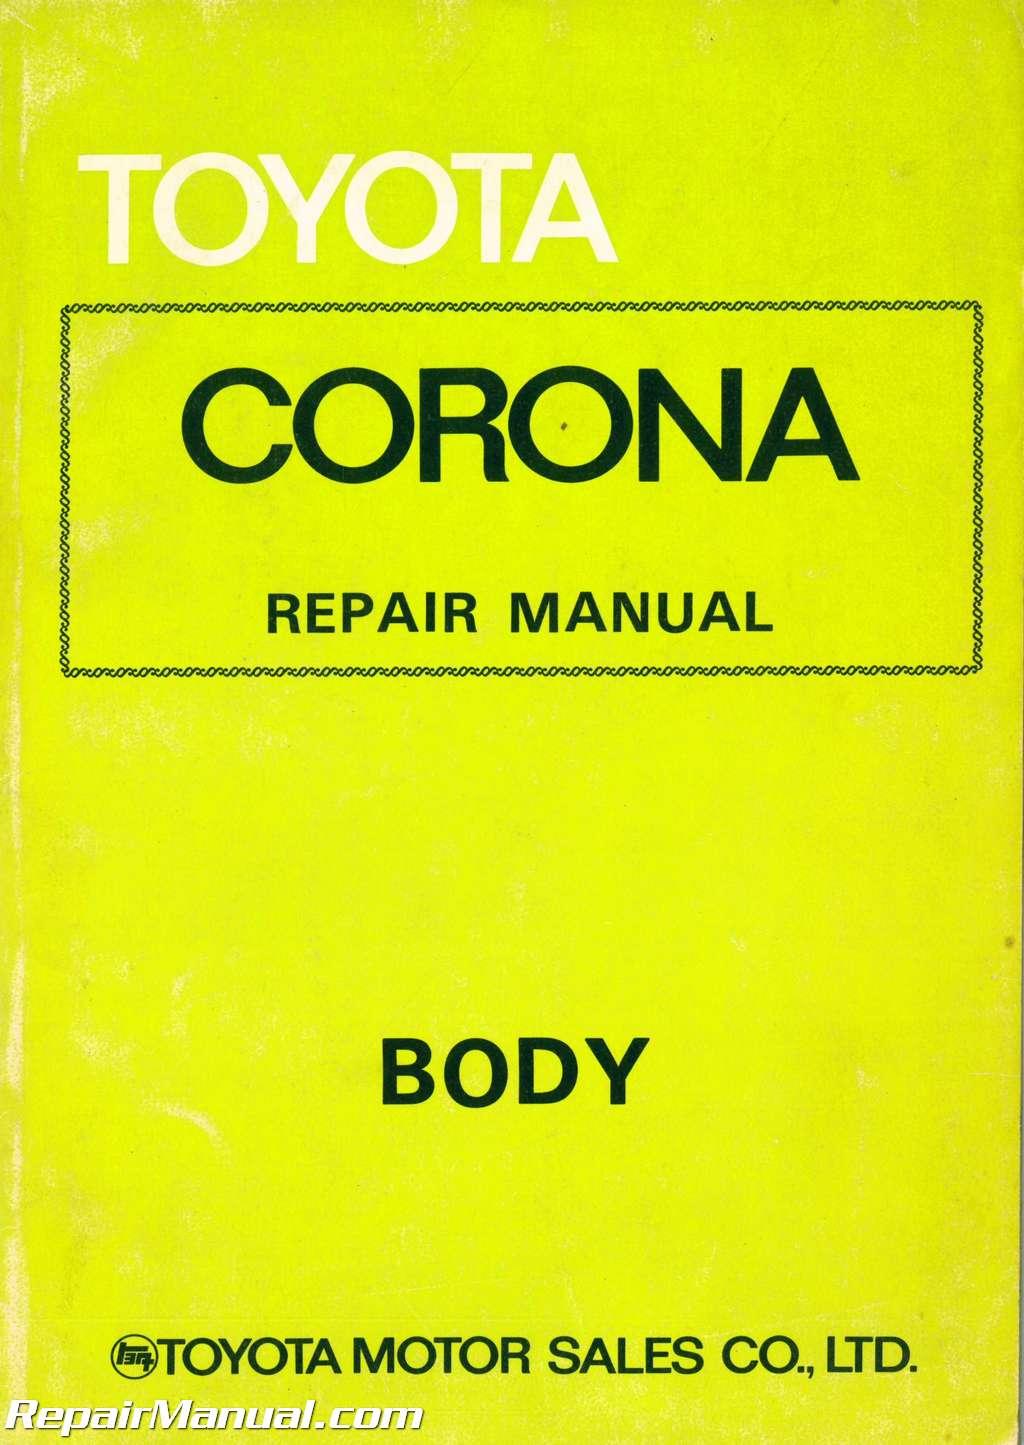 used 1973 toyota corona body group repair manual rh repairmanual com Toyota Corona 1990 toyota corolla 1986 service manual